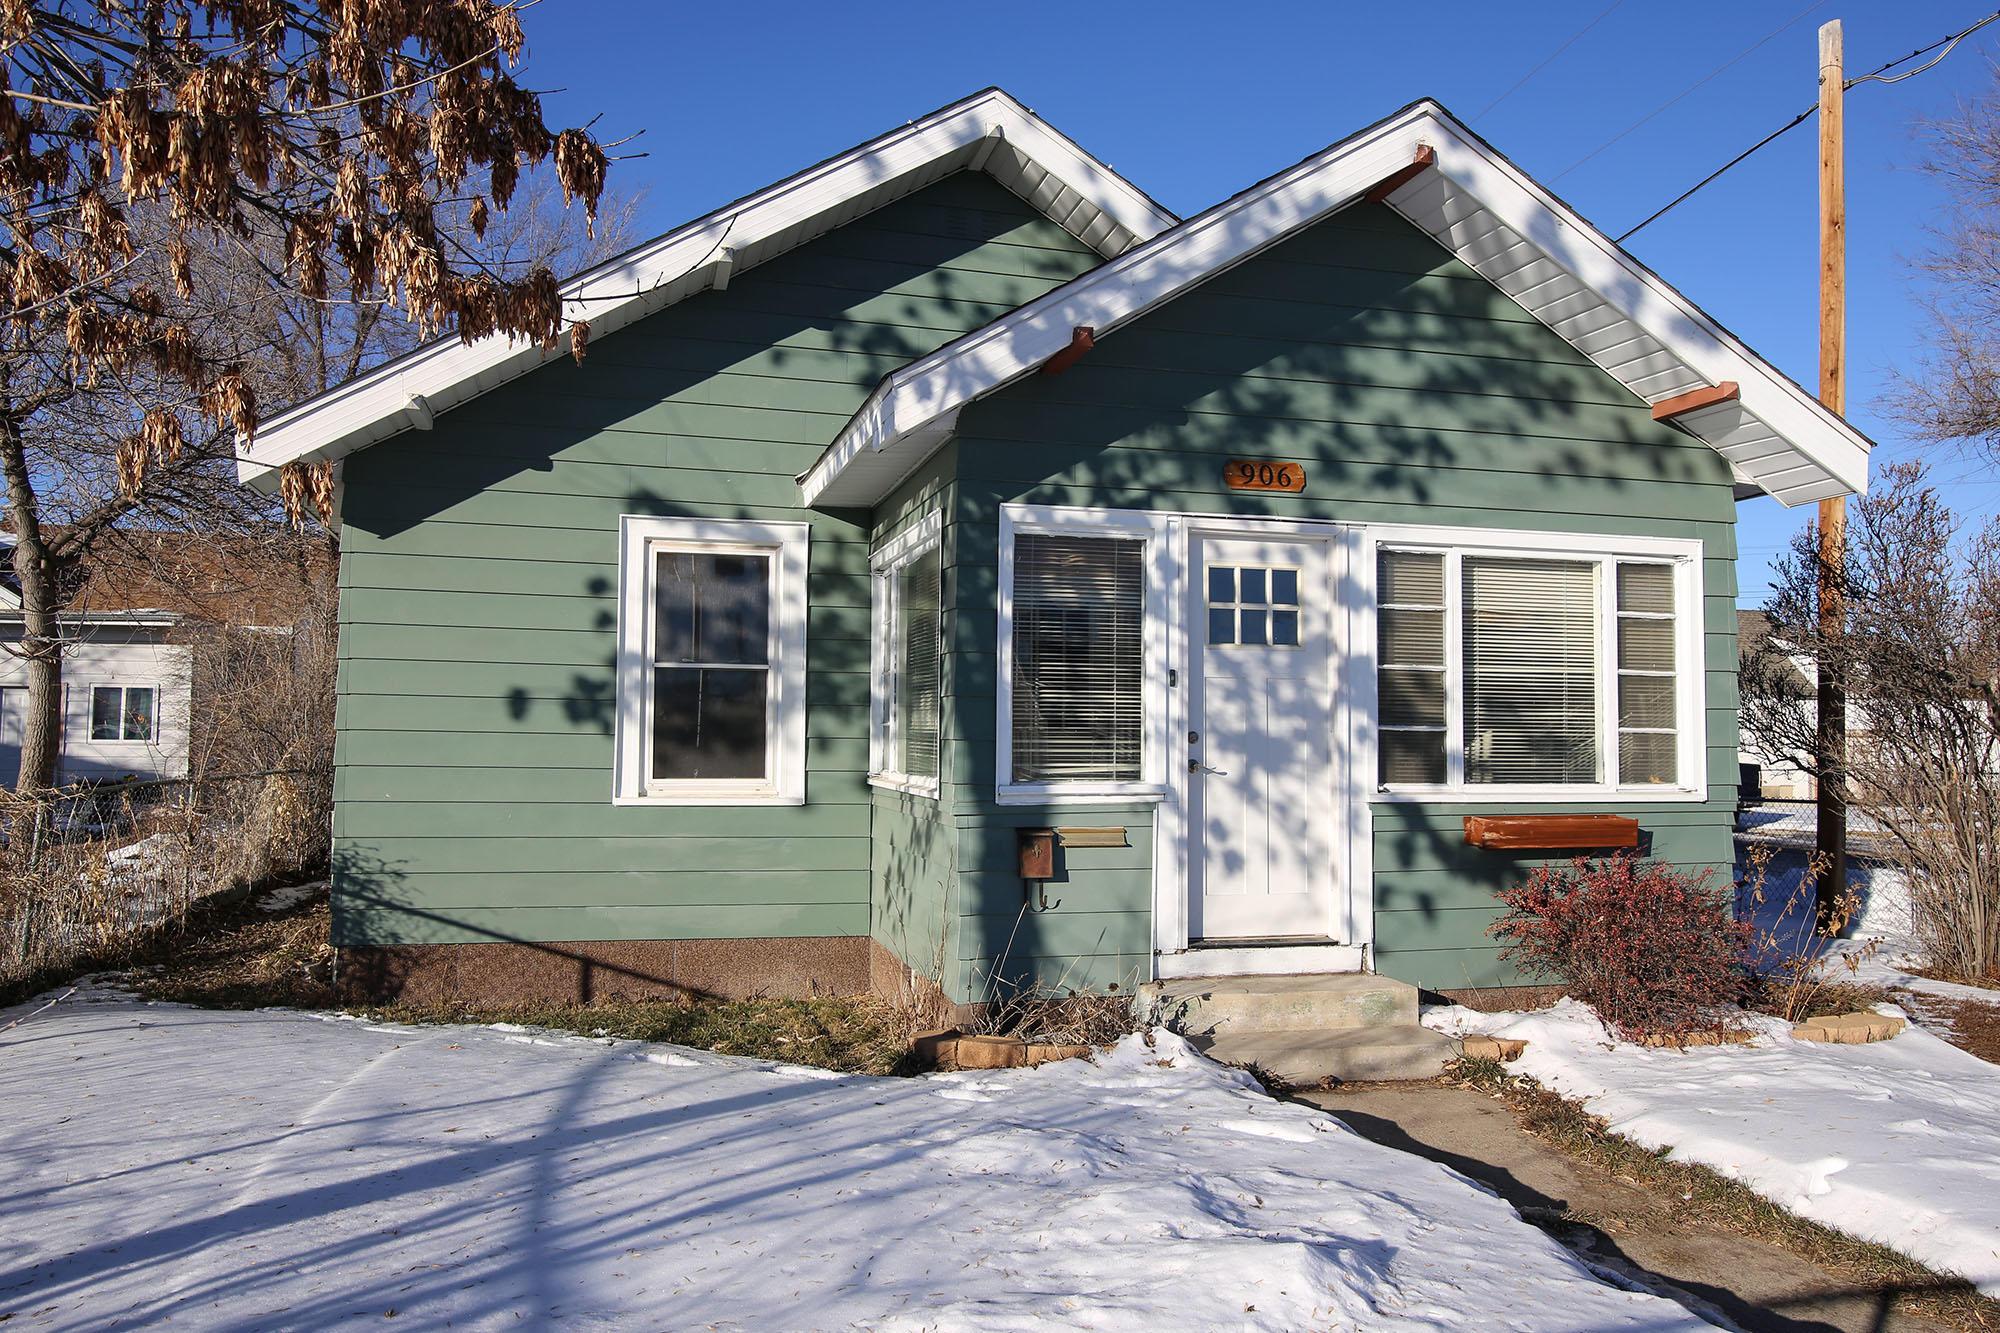 906 S Sheridan Avenue, Sheridan, Wyoming 82801, 2 Bedrooms Bedrooms, ,1 BathroomBathrooms,Residential,For Sale,Sheridan,19-36